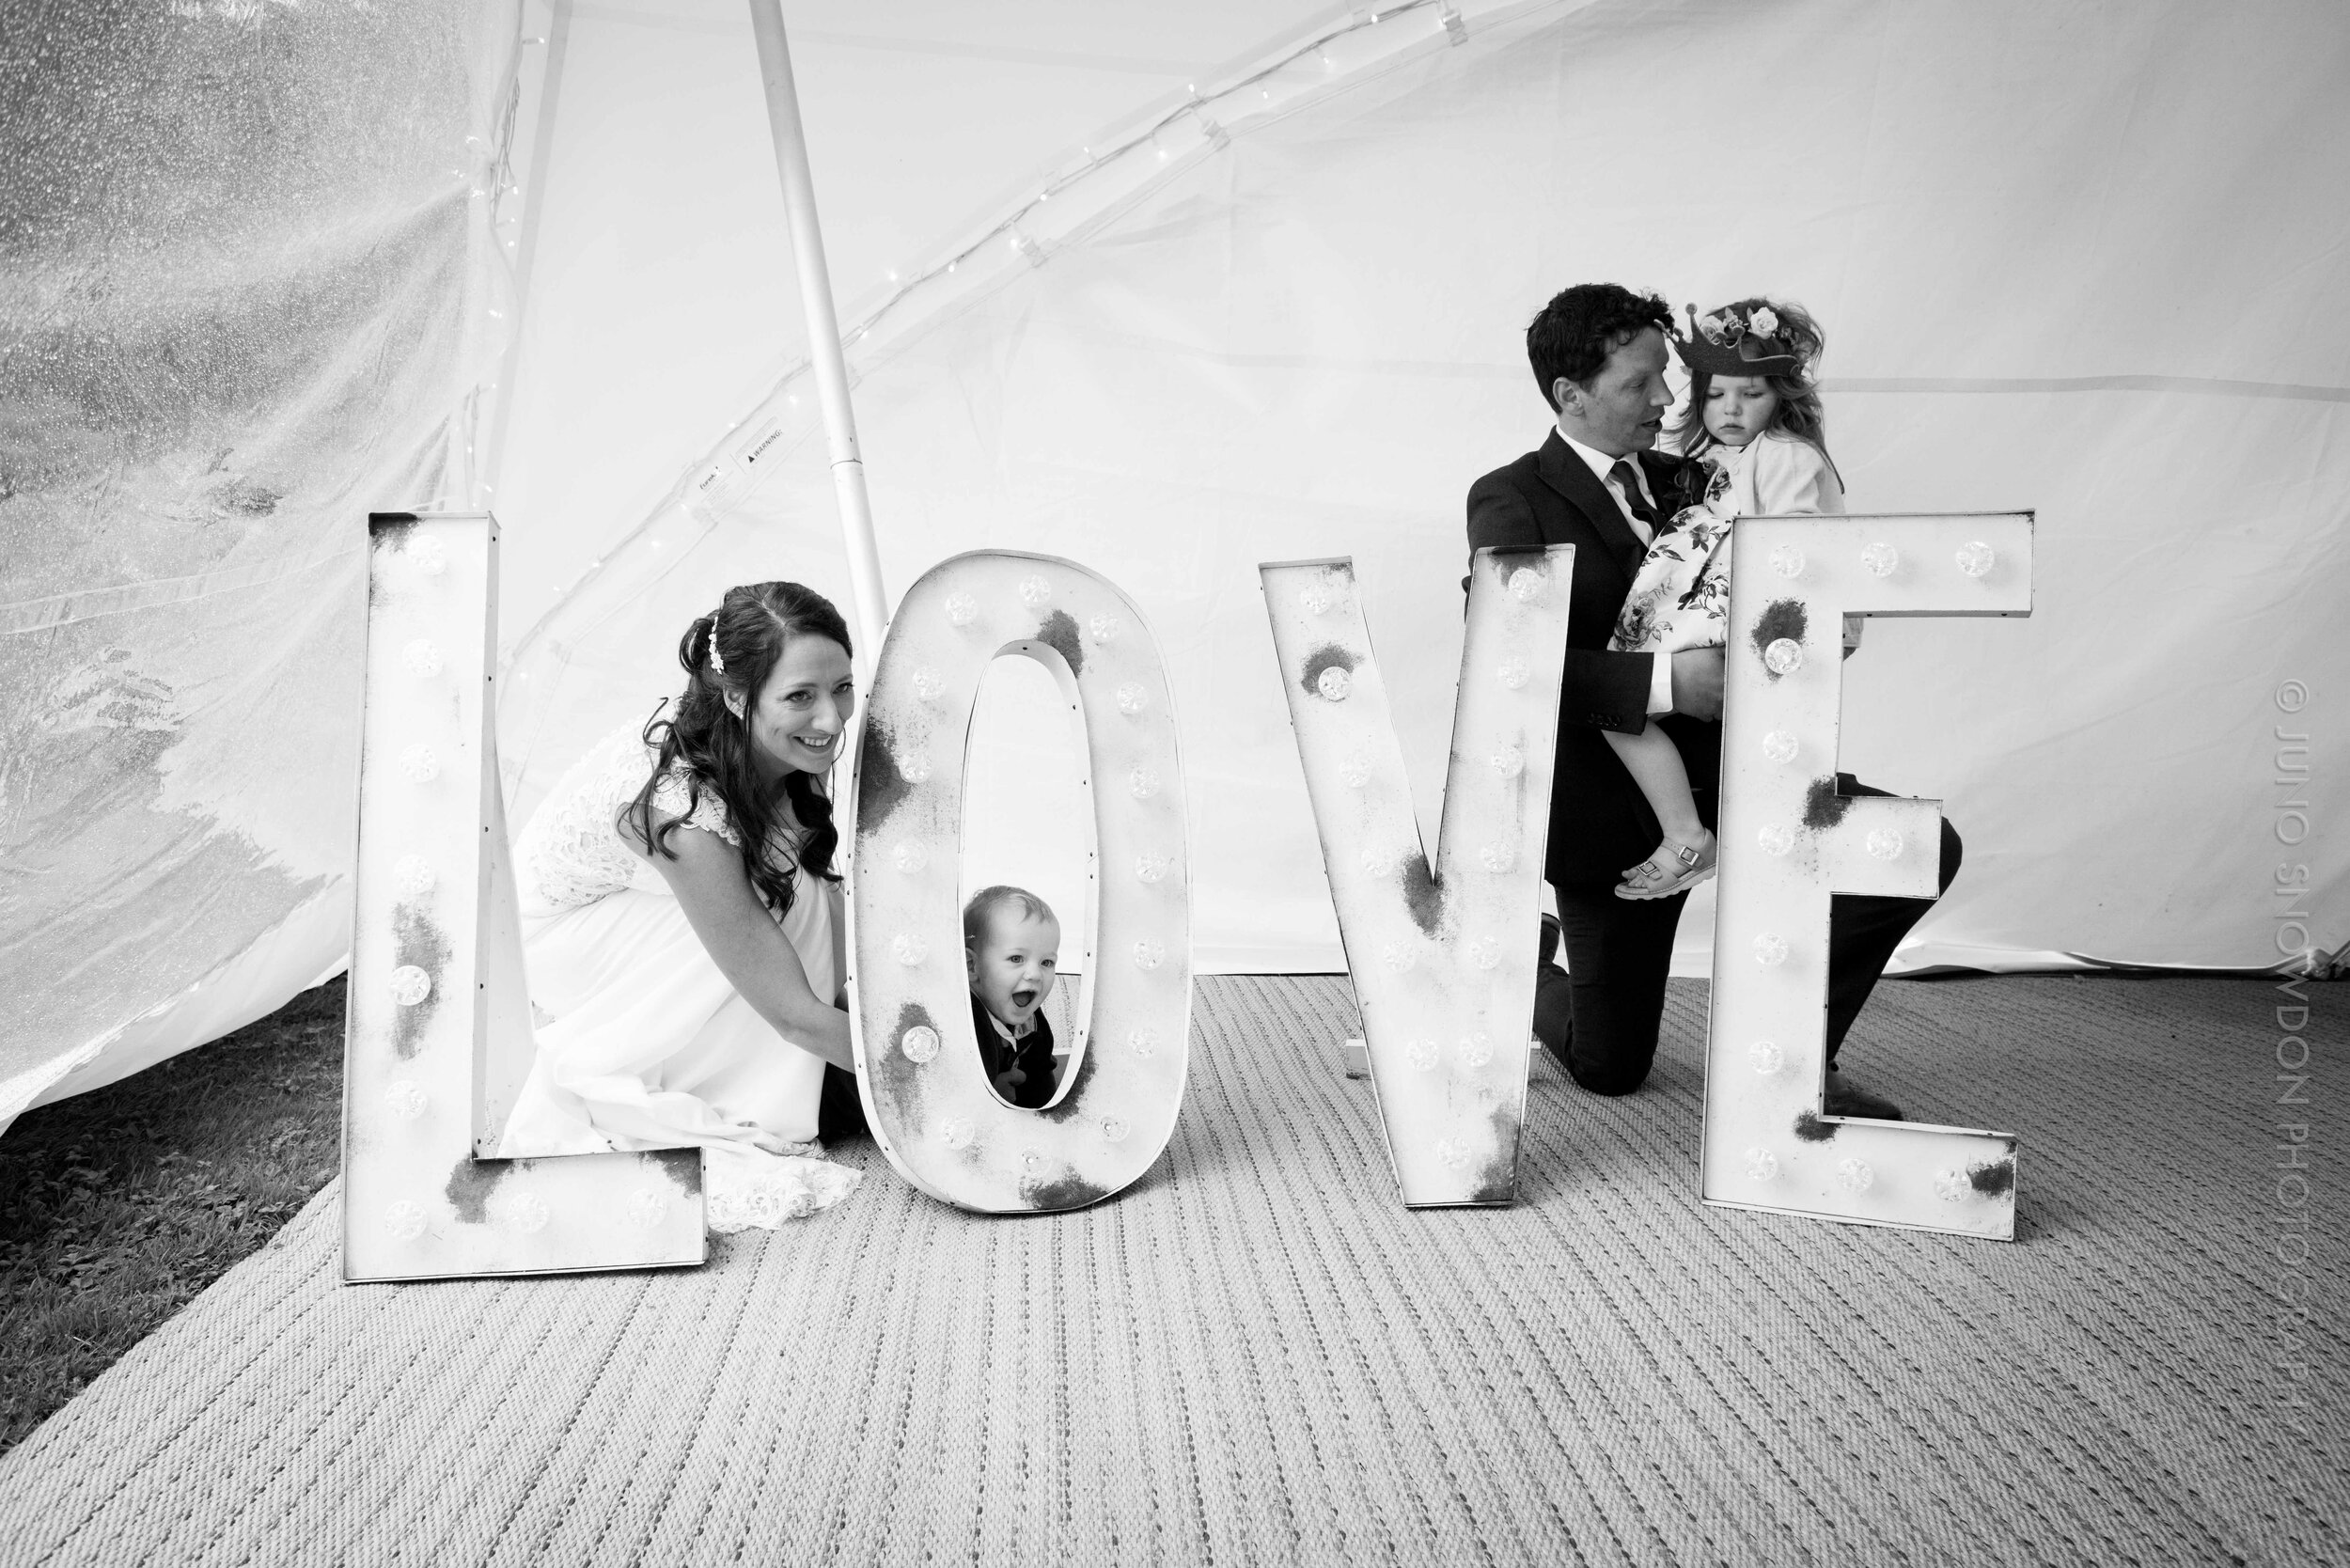 juno-snowdon-photography-wedding-8191.jpg